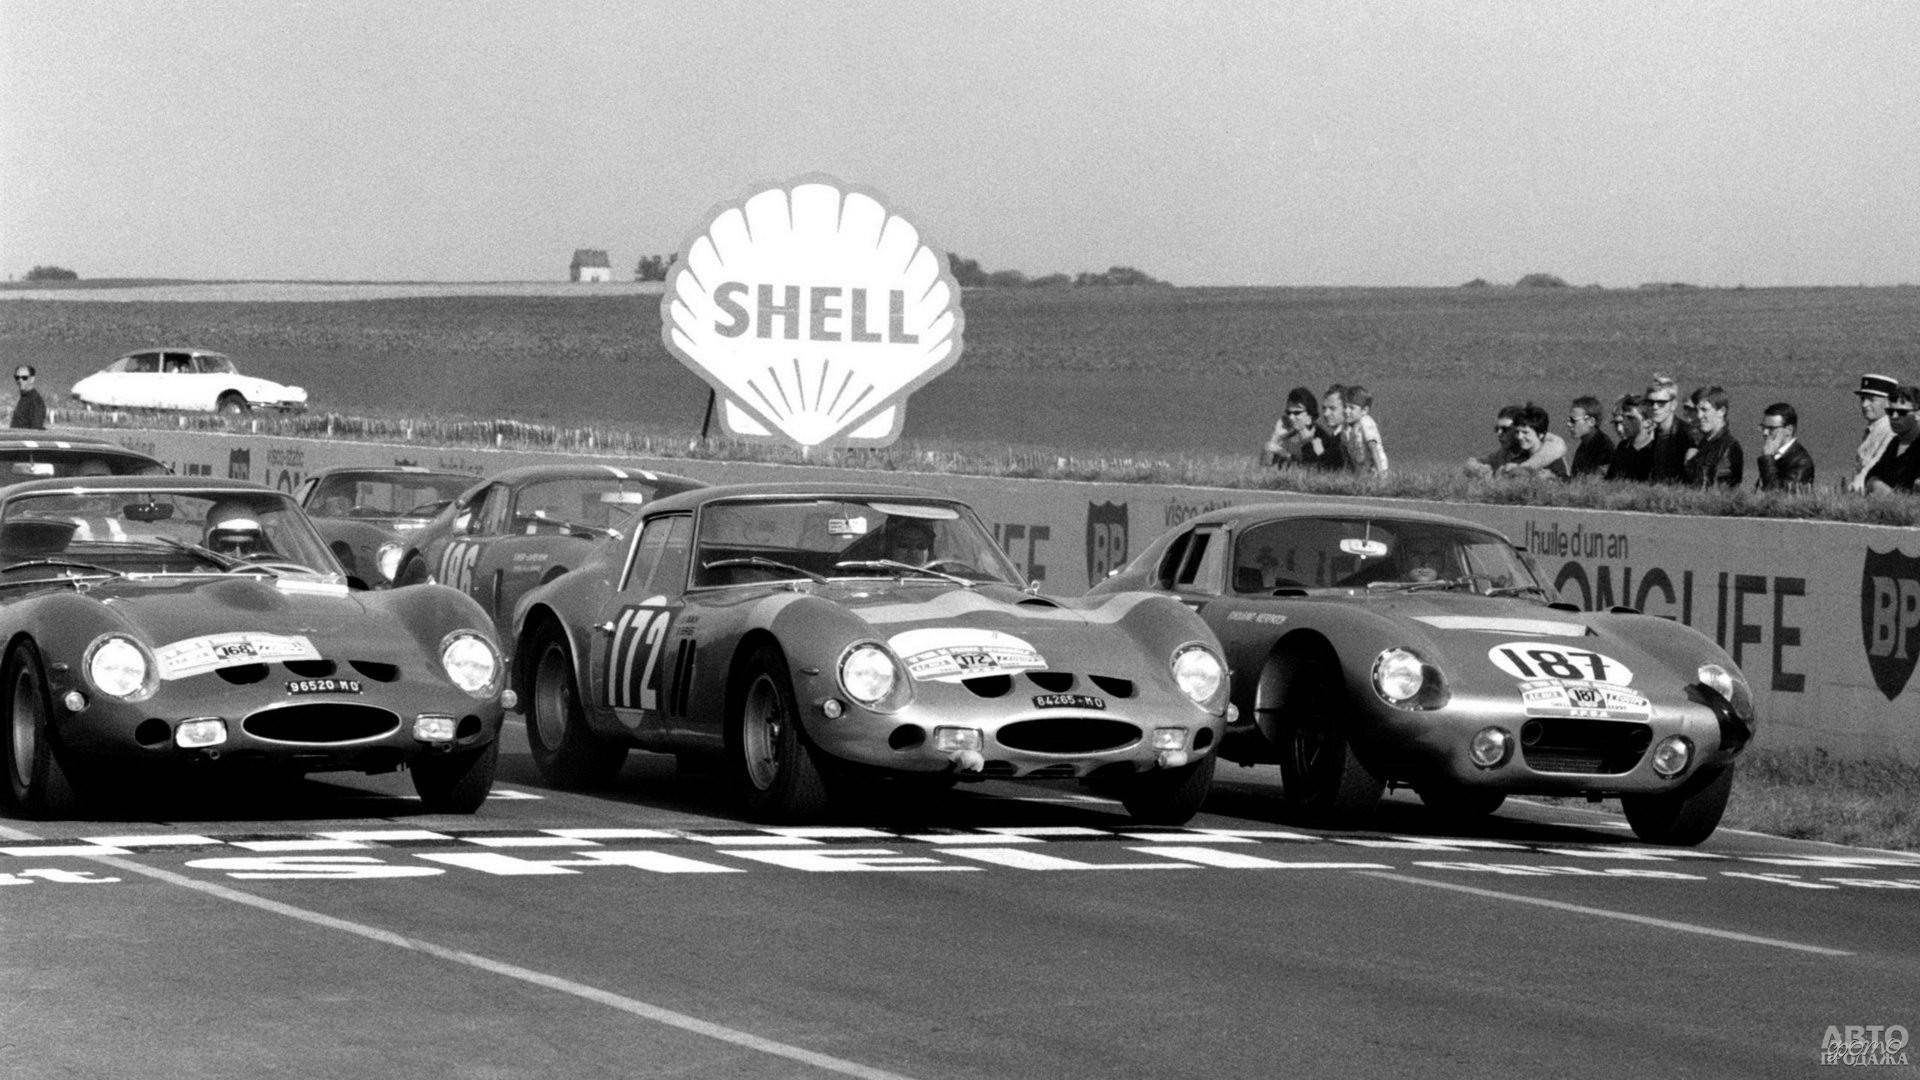 В 1963 году GTO не оставил ни единого шанса главному сопернику Shelby Cobra